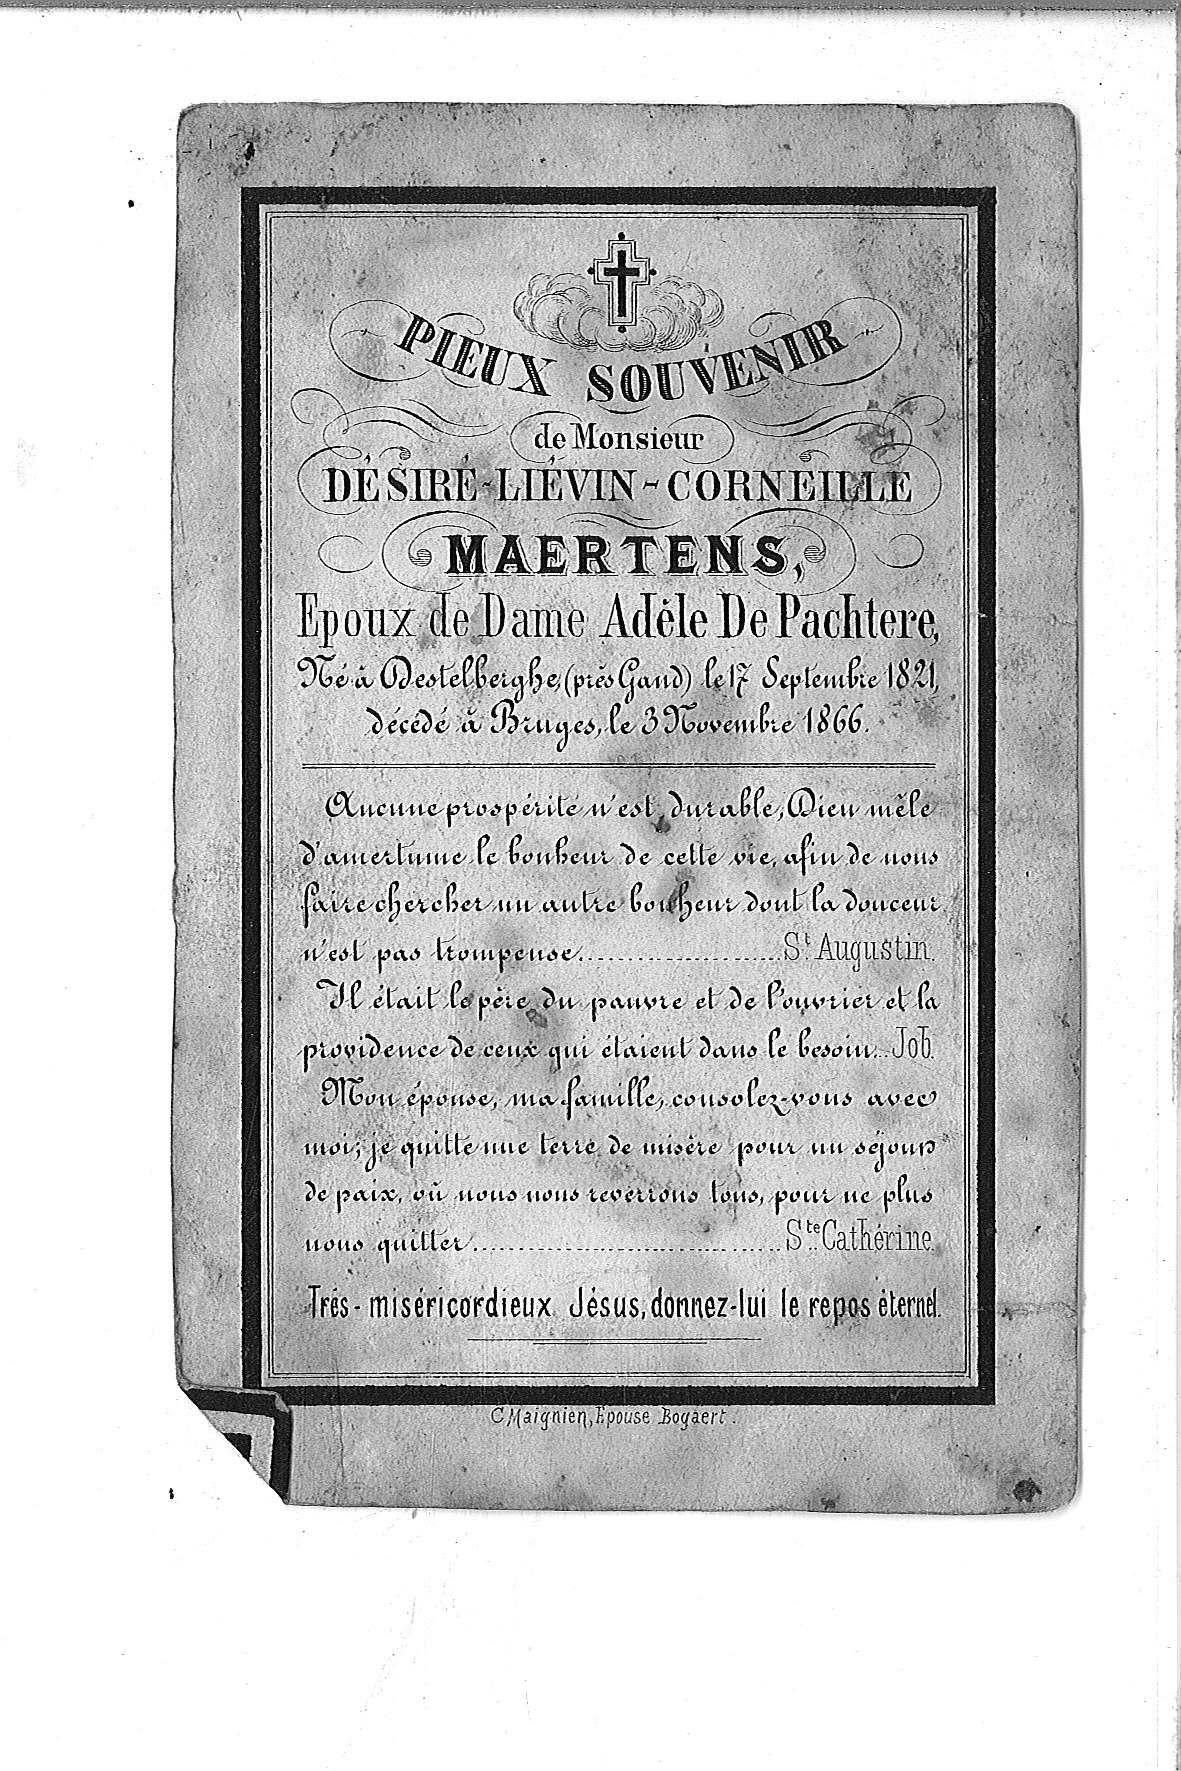 Desiré-Lievin-Corneille(1866)20120919110758_00024.jpg